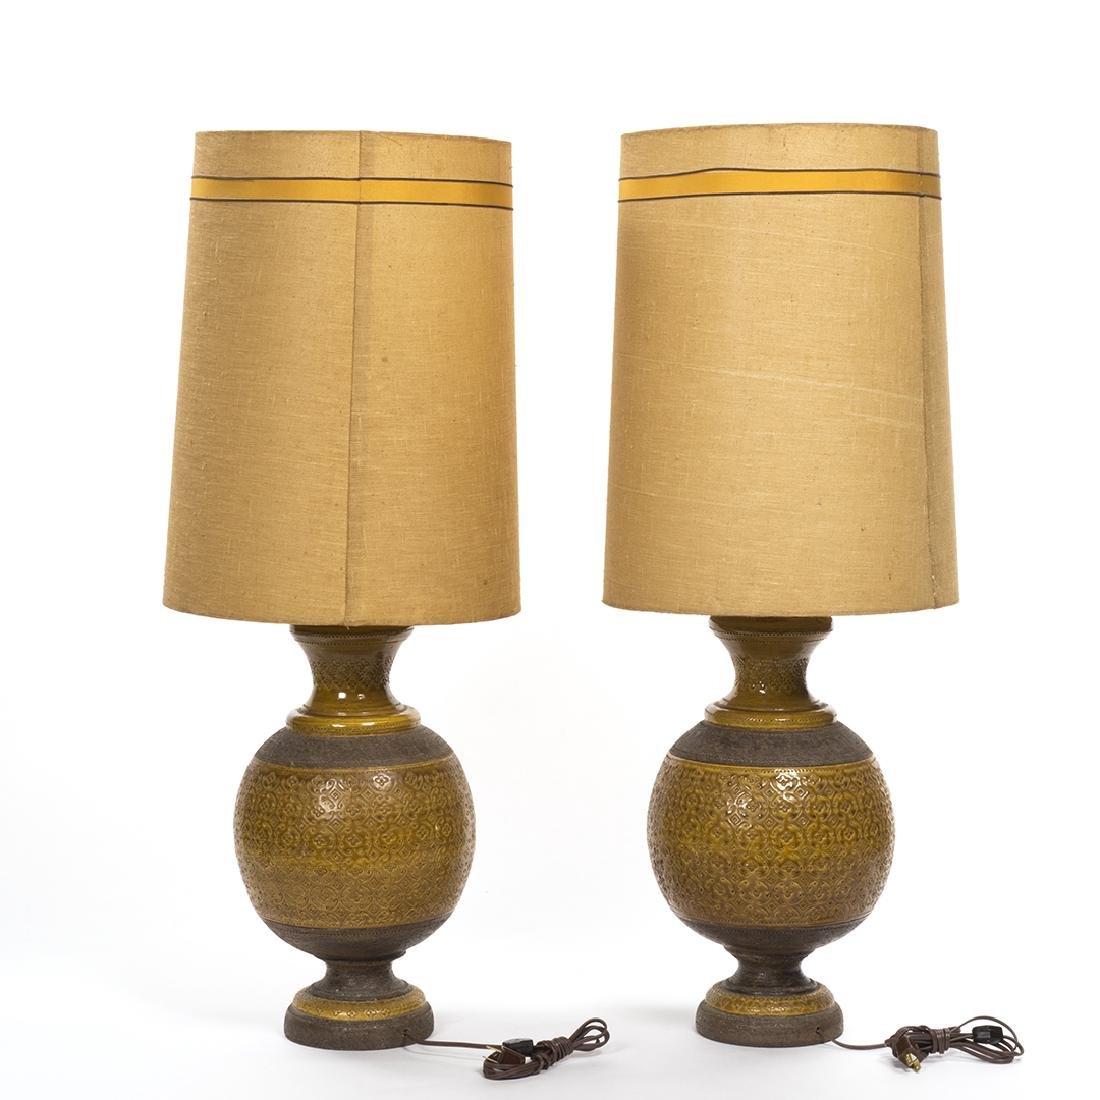 Aldo Londi Bitossi Lamps (2) - 2